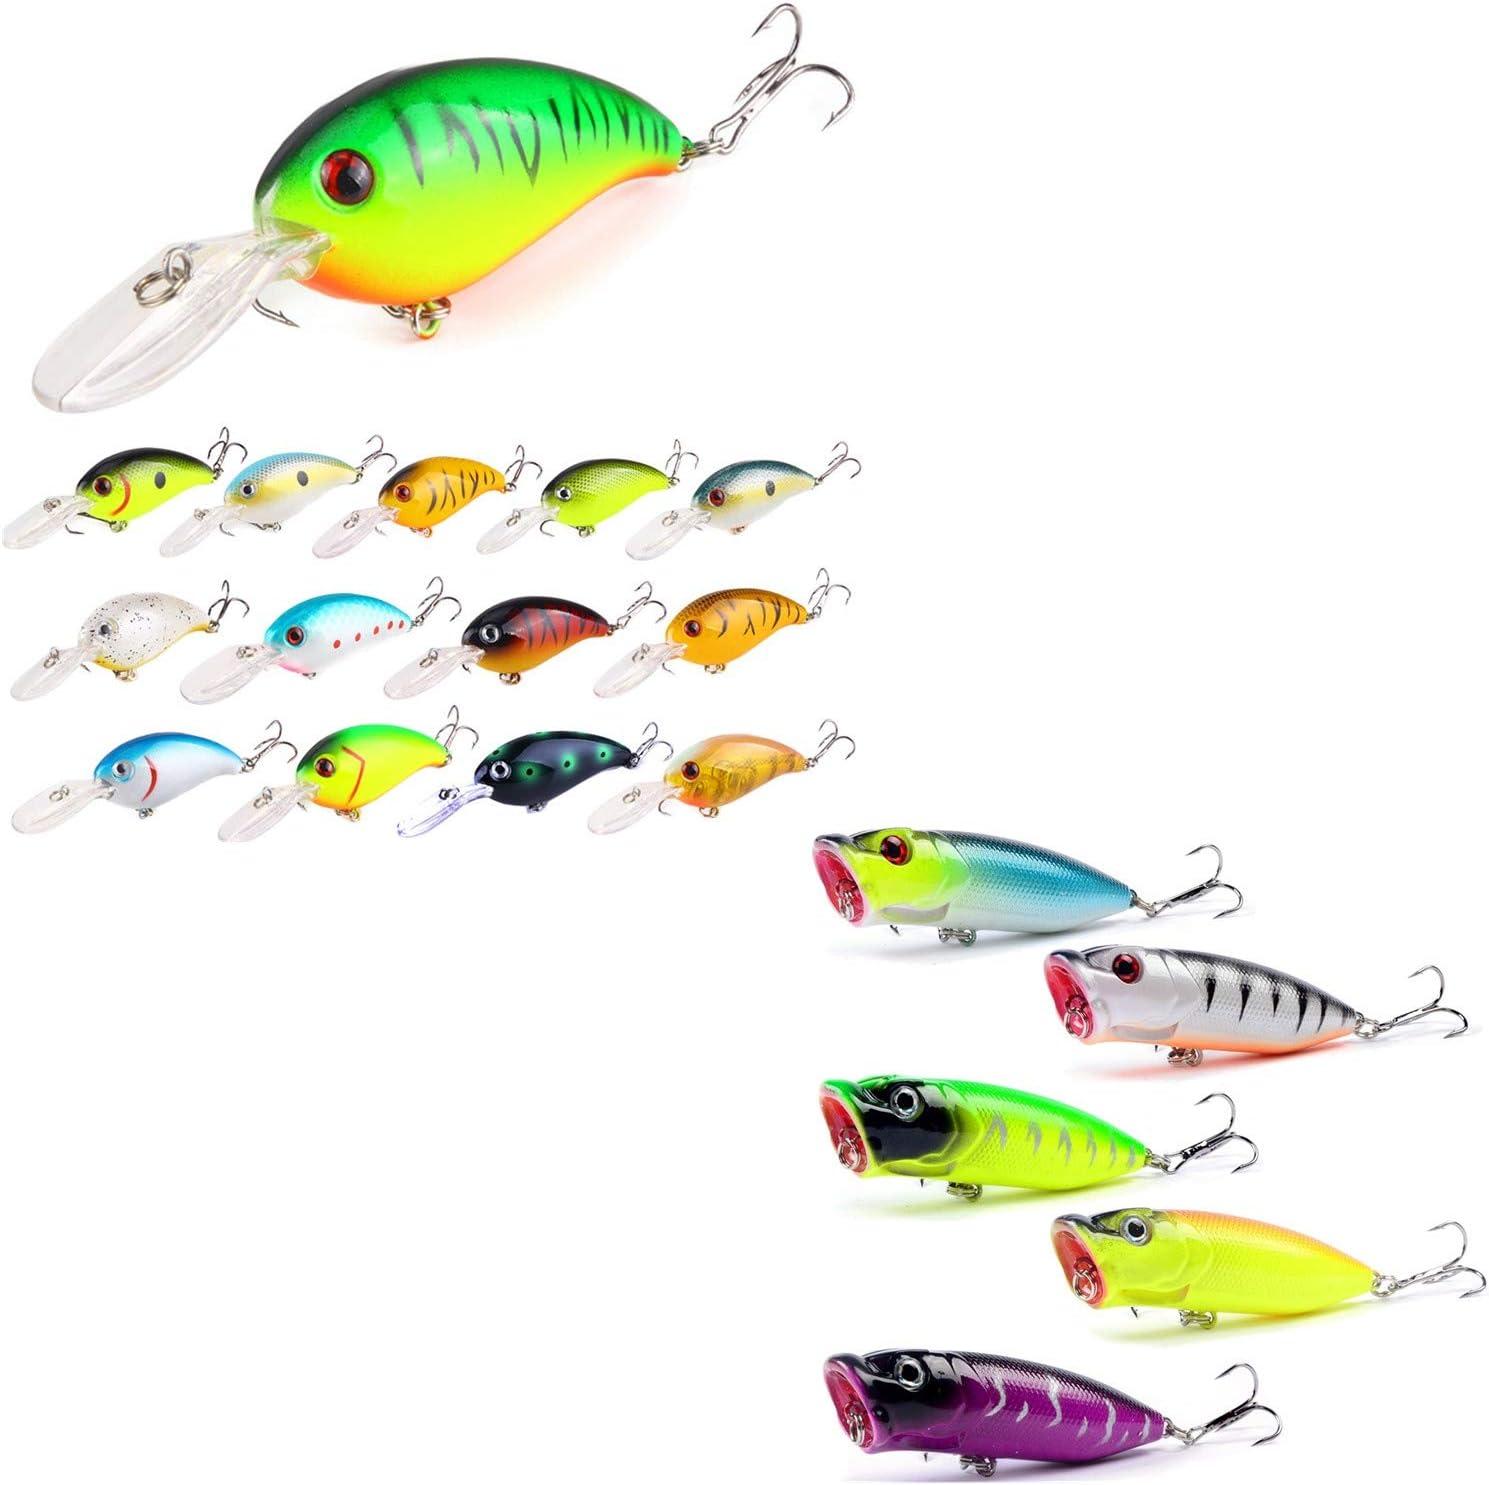 5PCS Fishing Bass Fish Topwater Popper Pencil Minnow Crankbaits lure hook baits